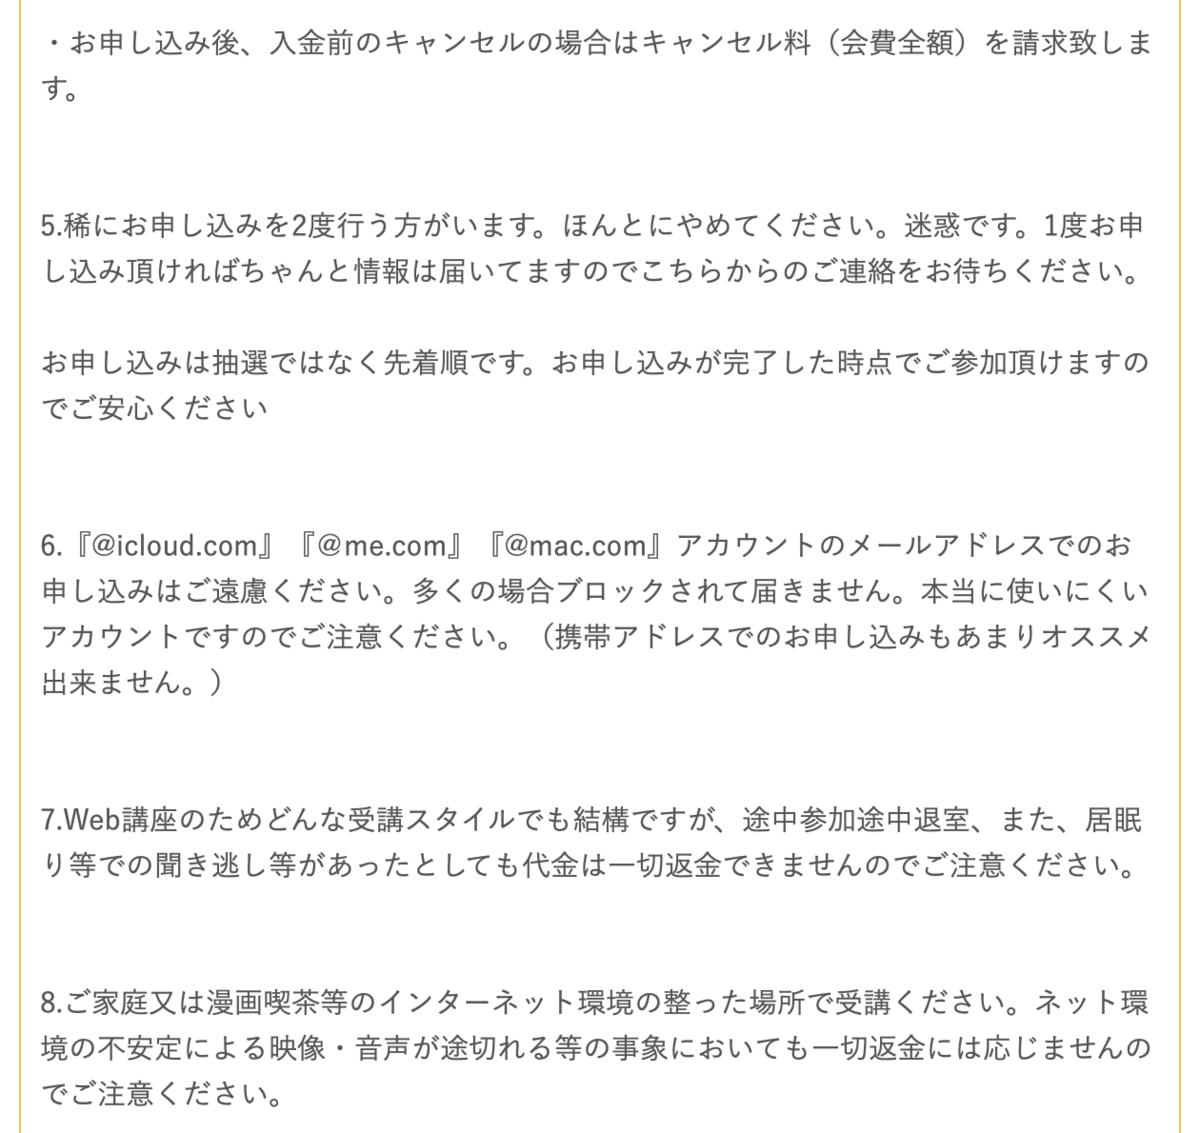 f:id:gen-ron:20200707161420p:plain